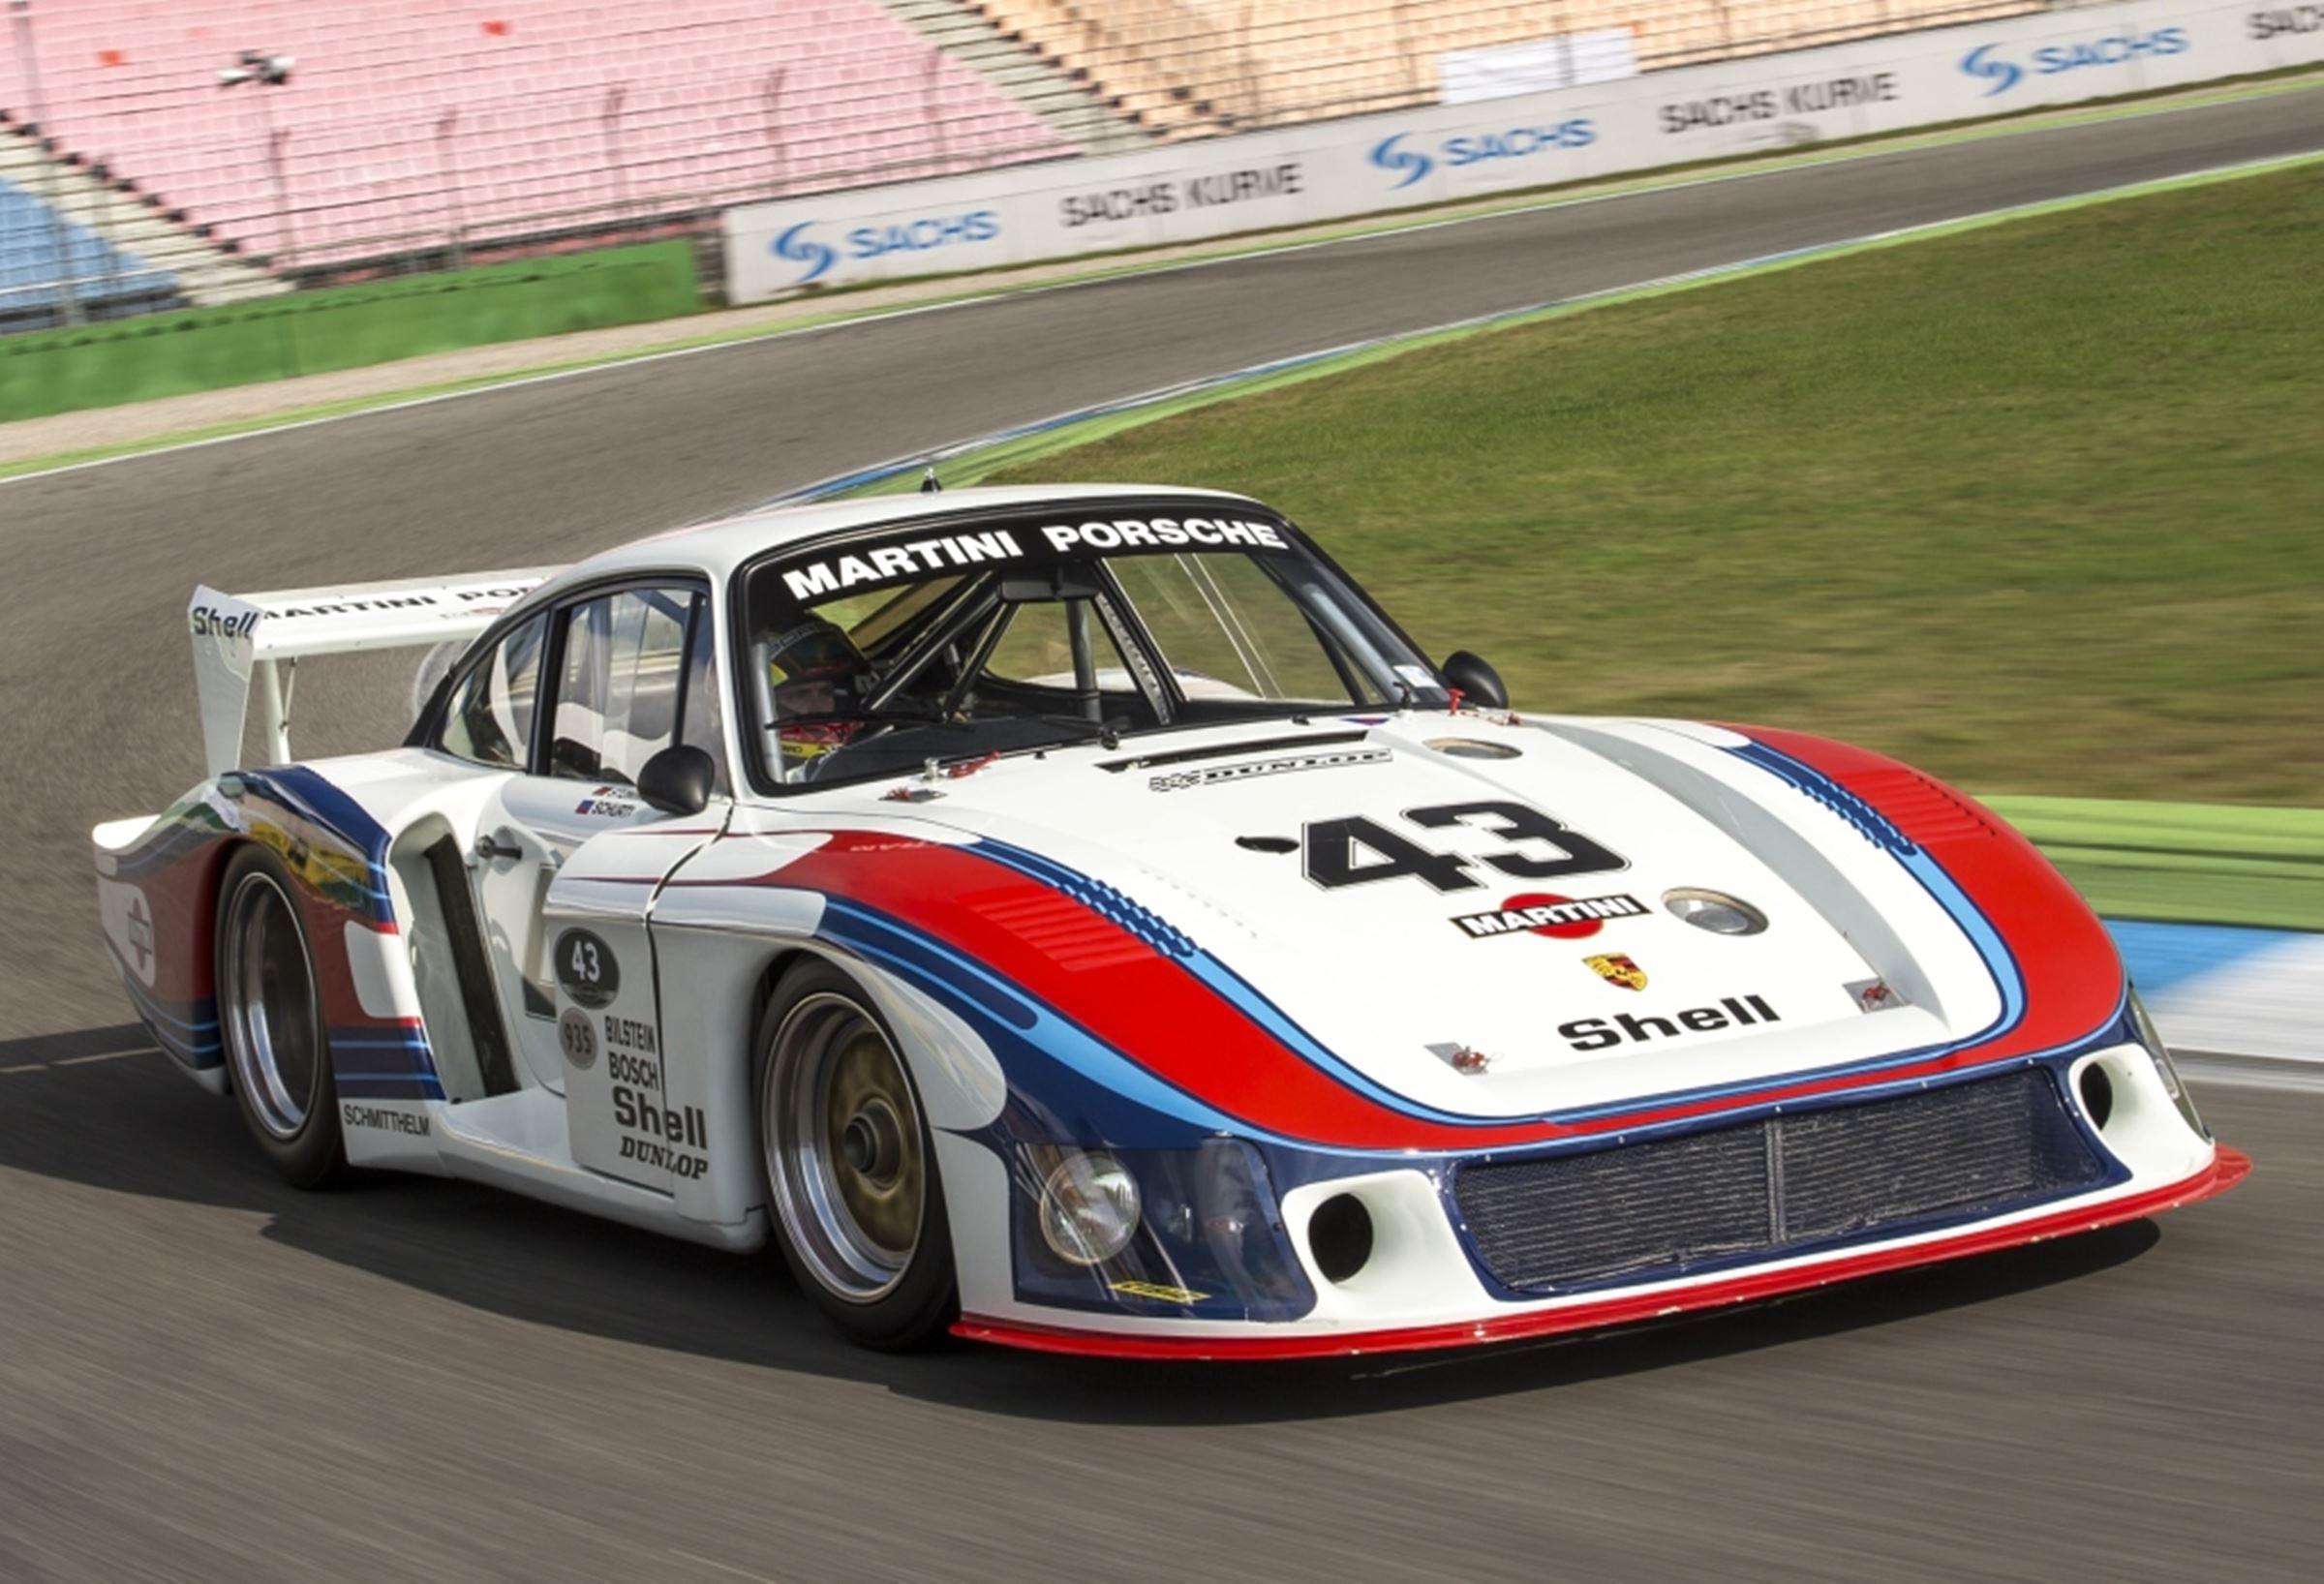 Porsche 935/78 Le Mans